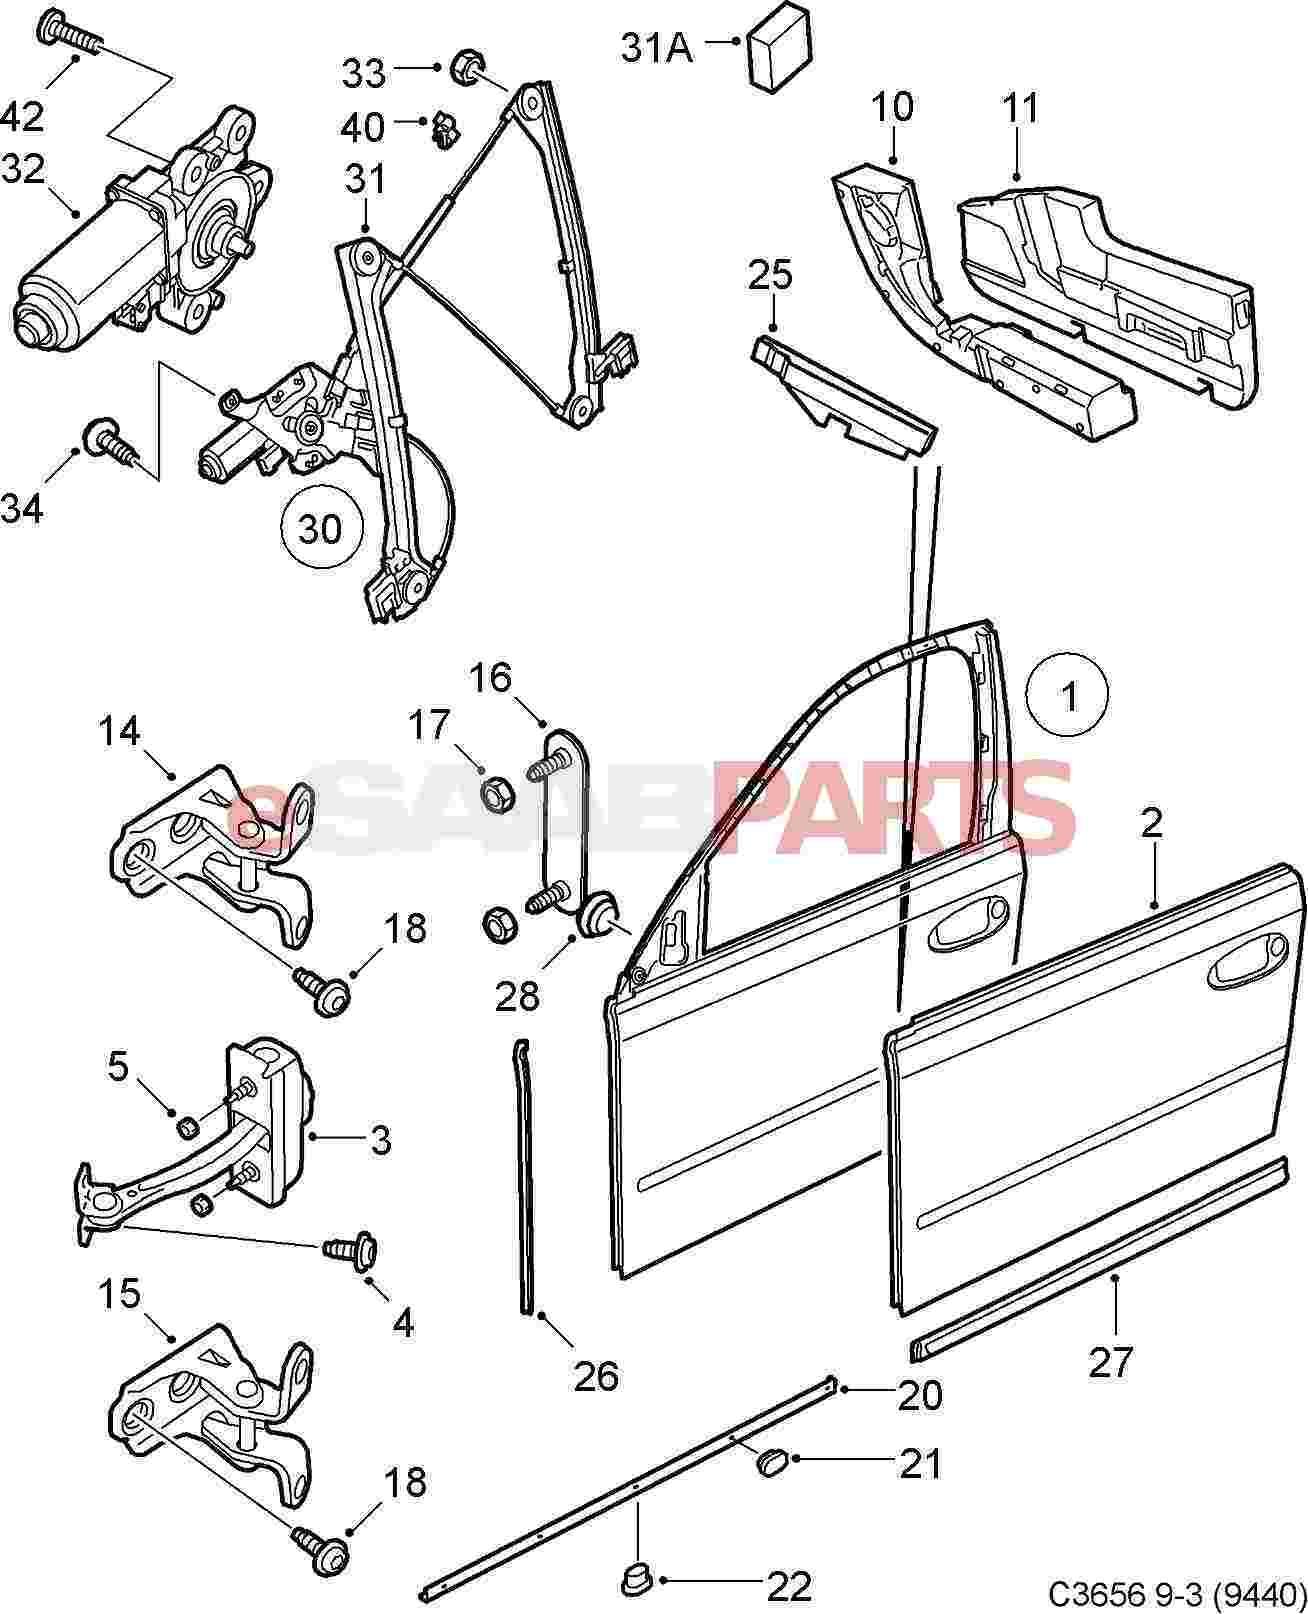 Ls2 Wiring Diagram Parts Wiring Diagram Images